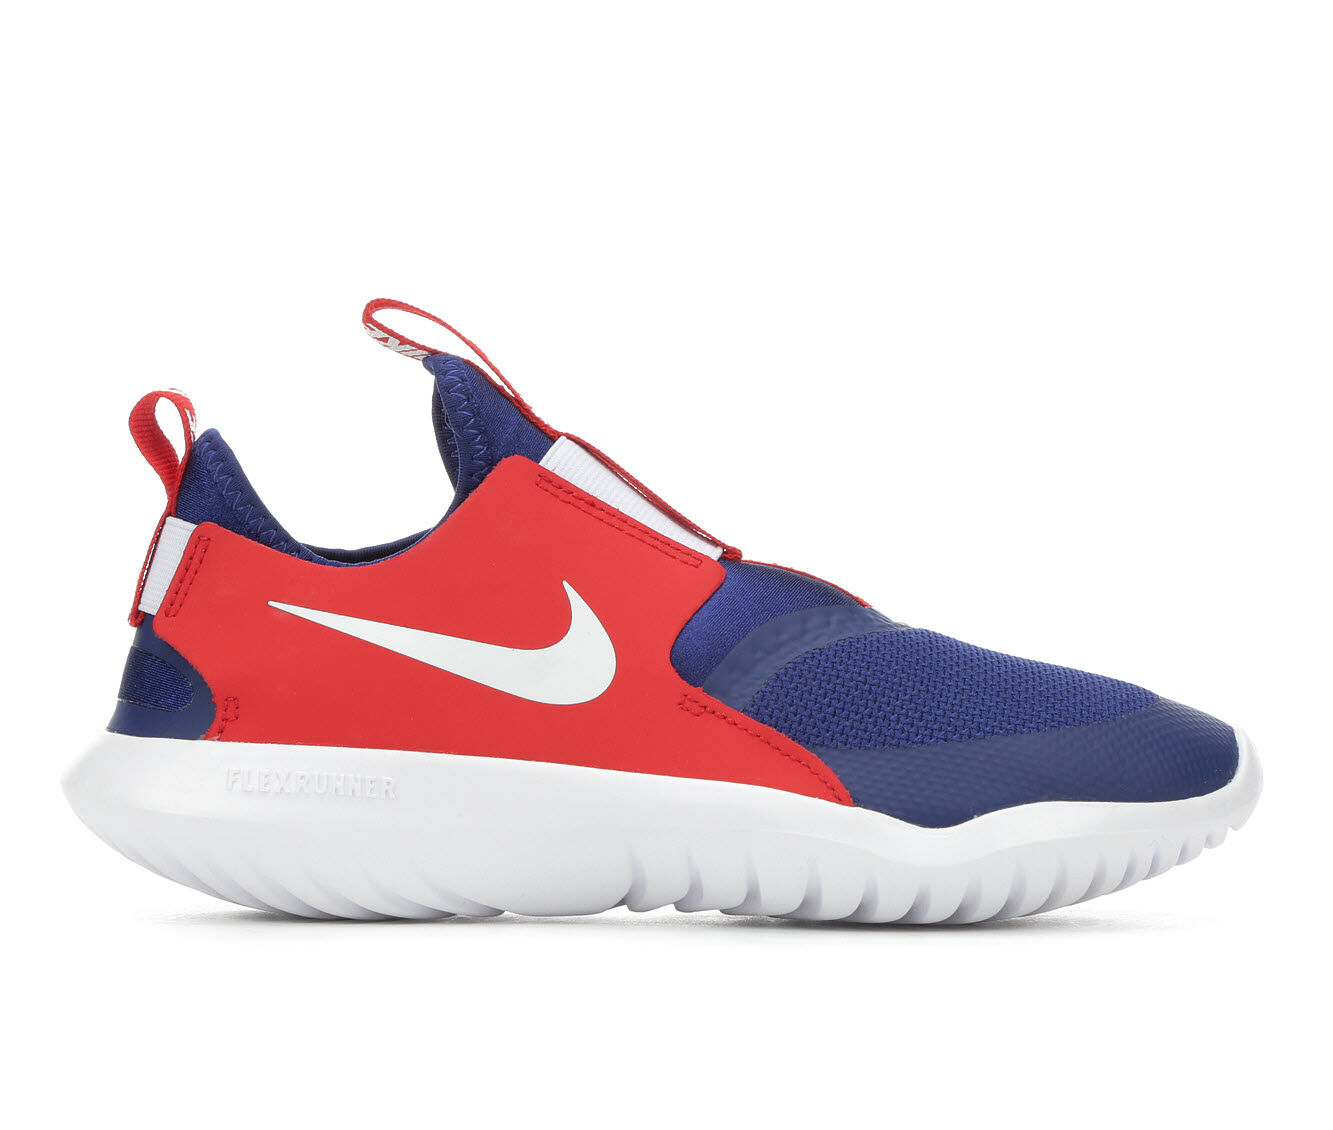 Boys' Nike Big Kid Flex Runner Running